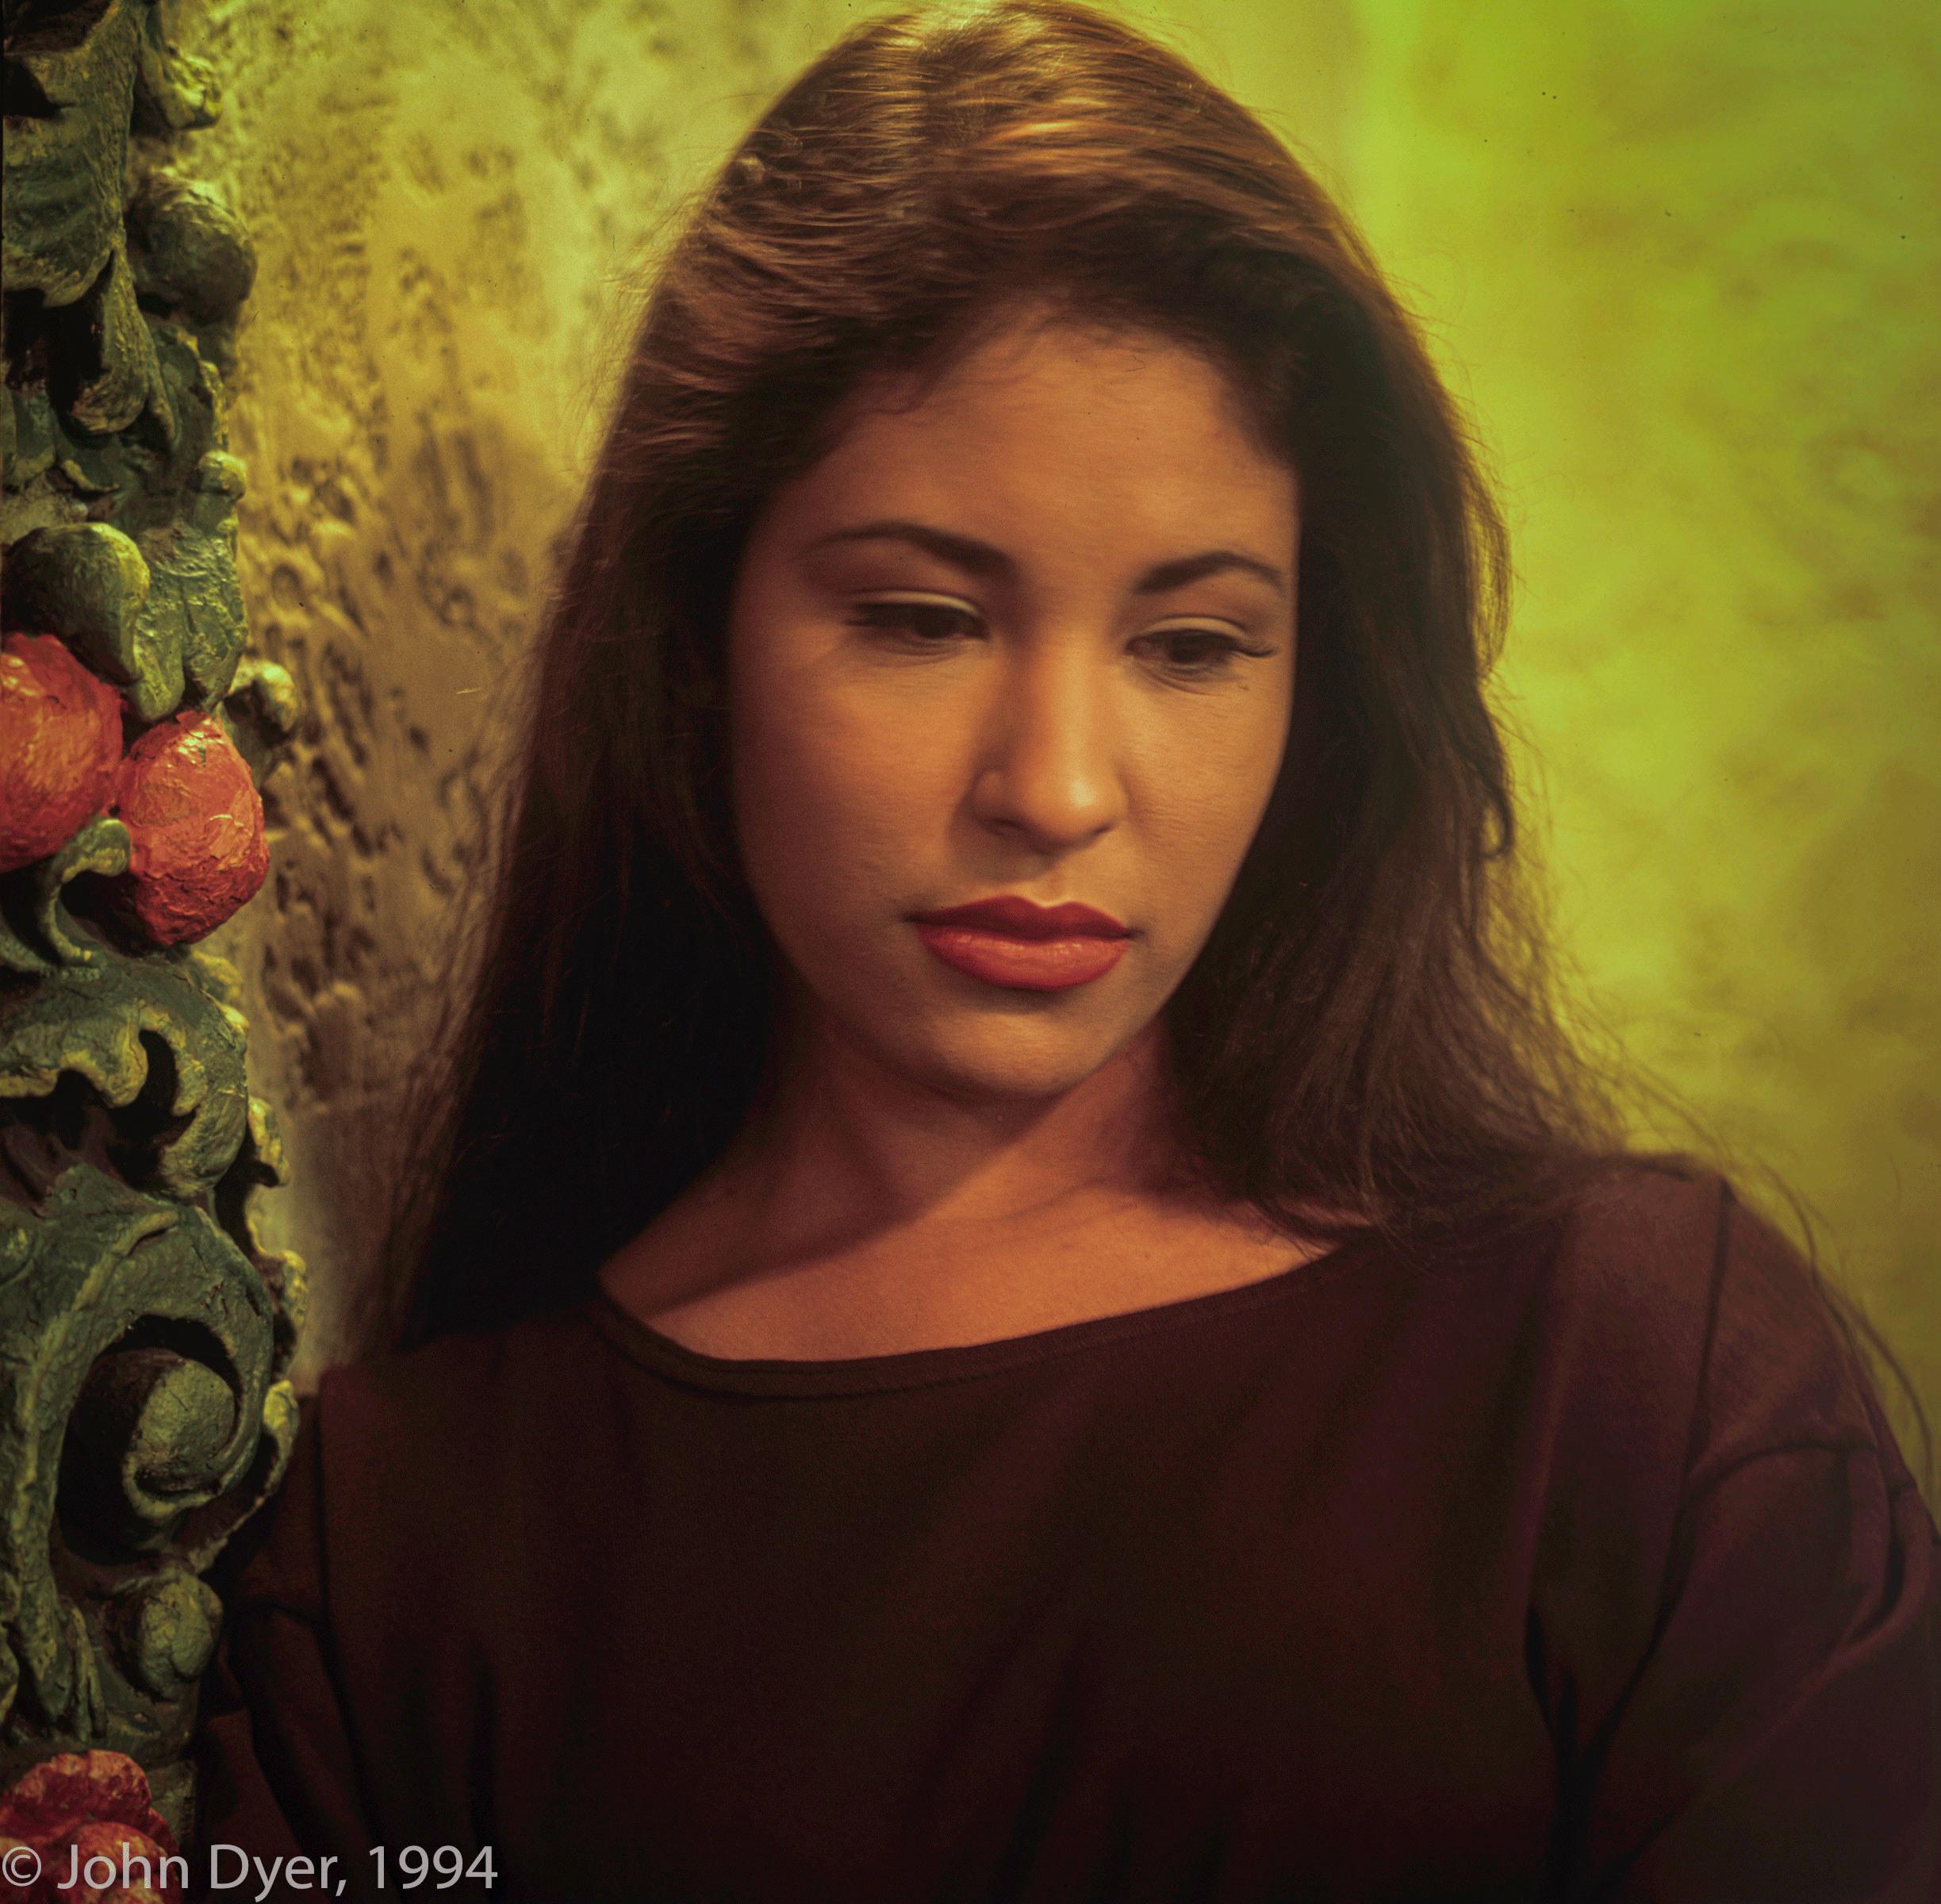 selena quintanilla looking somber while wearing a black shirt